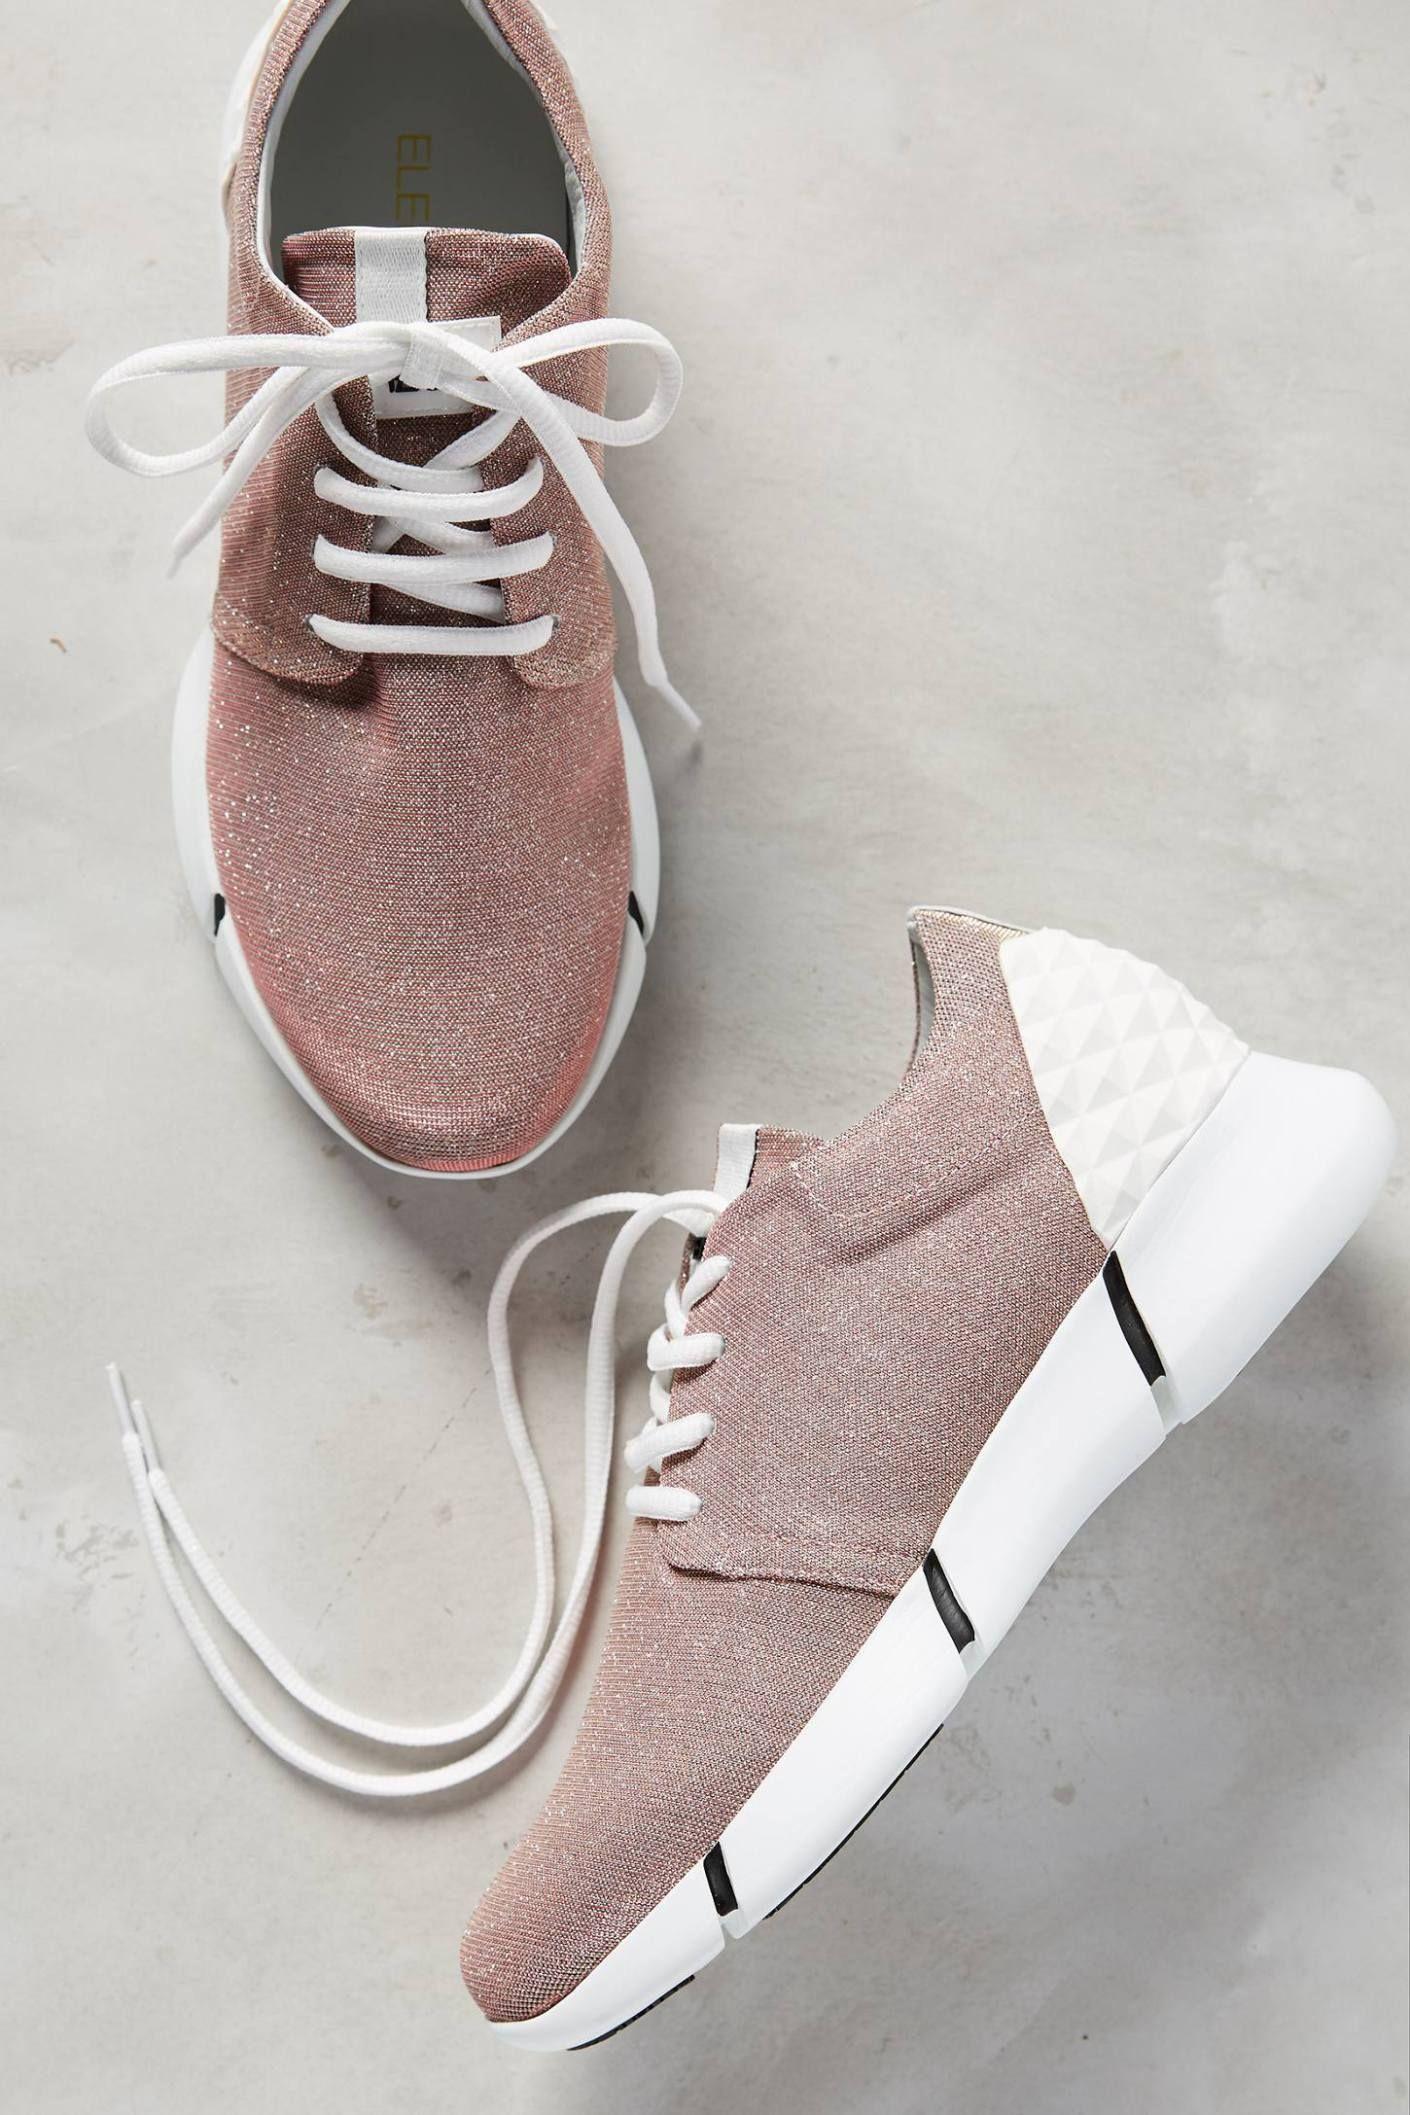 Anthropologie's New Arrivals: Sneakers | Zapatos de otoño